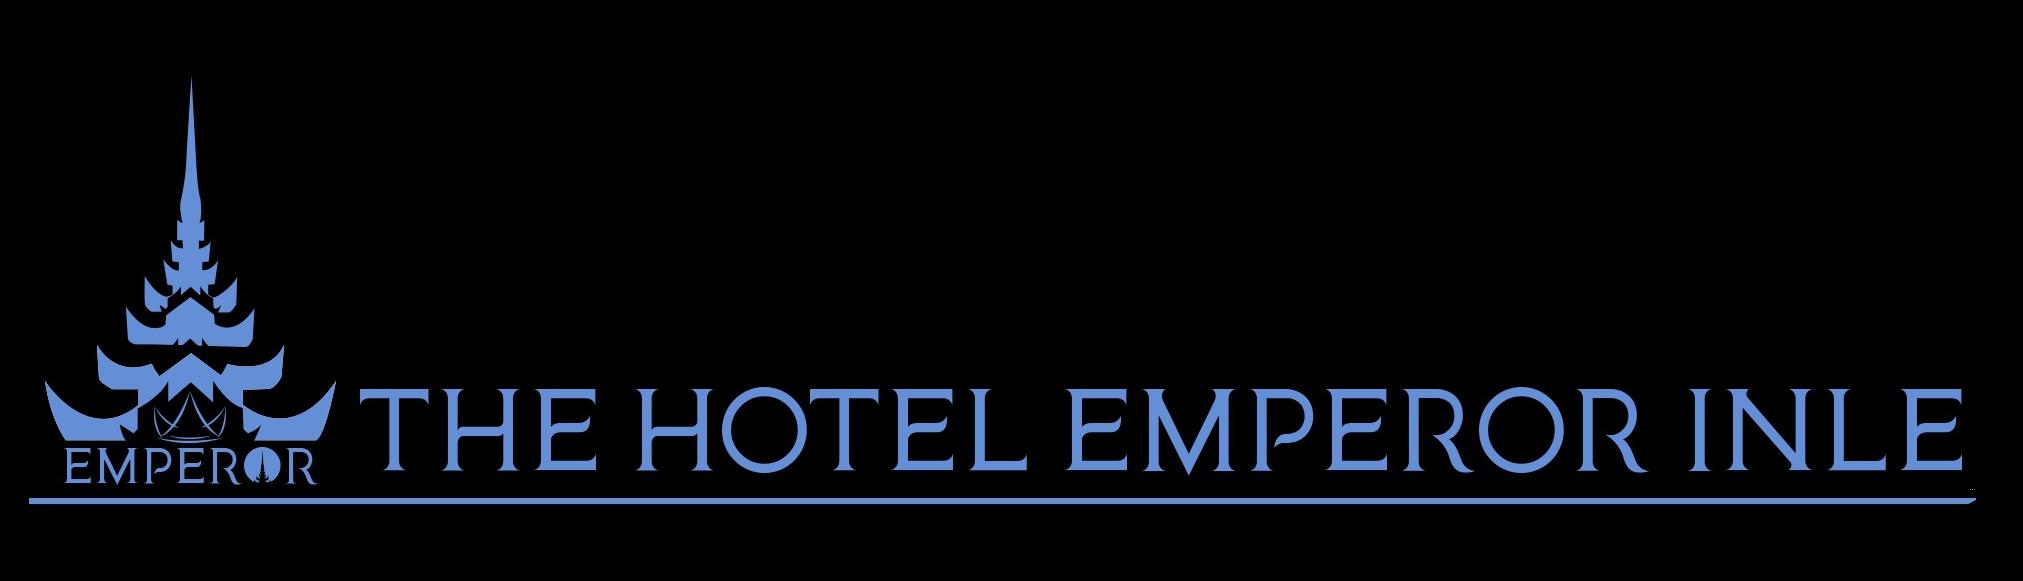 The Hotel Emperor-Inle